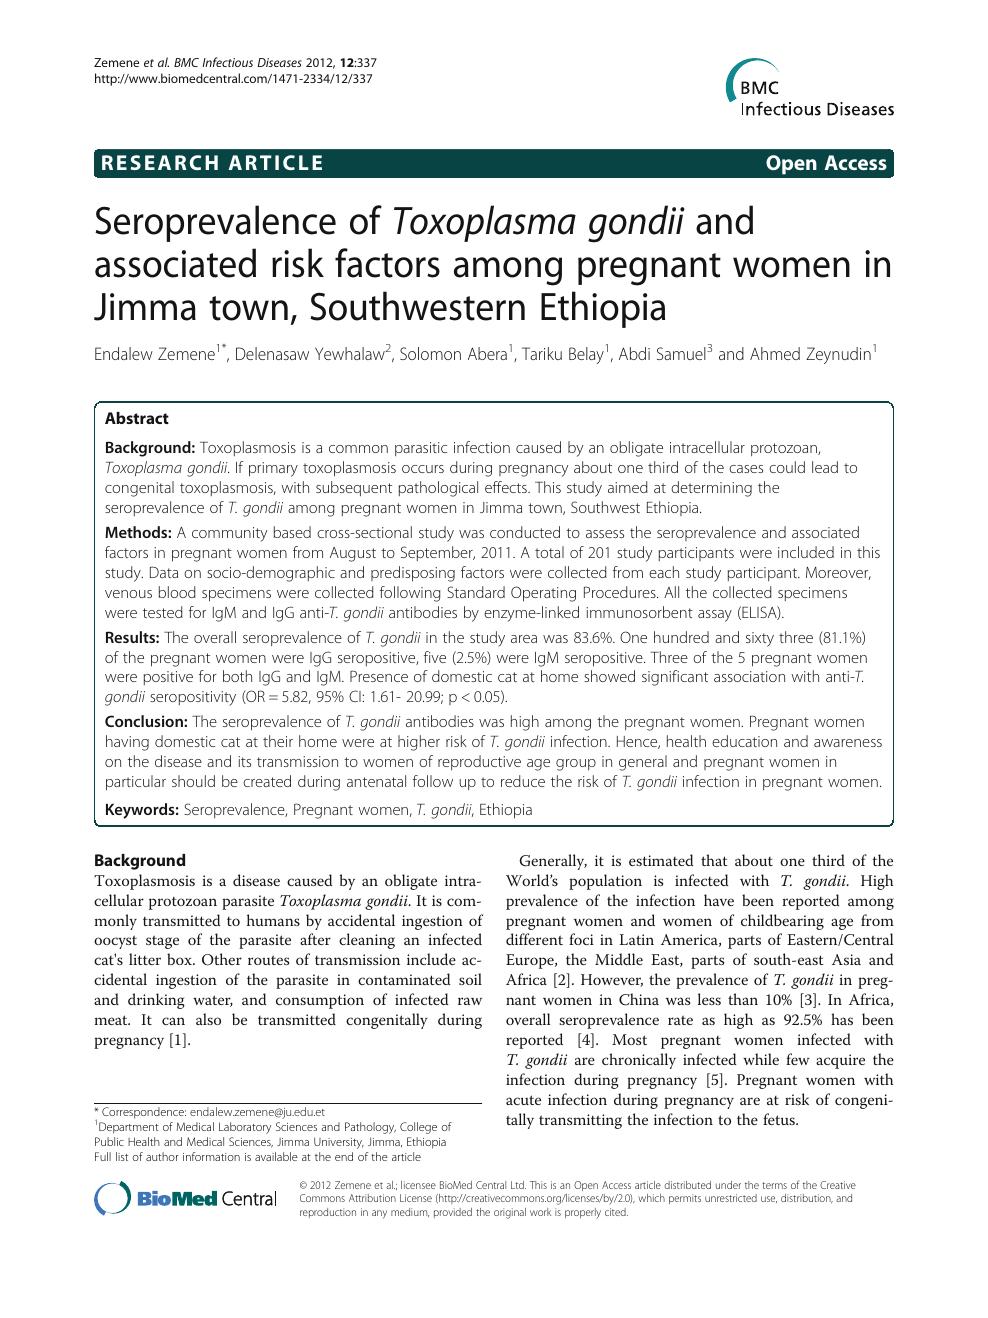 Seroprevalence of Toxoplasma gondii and associated risk